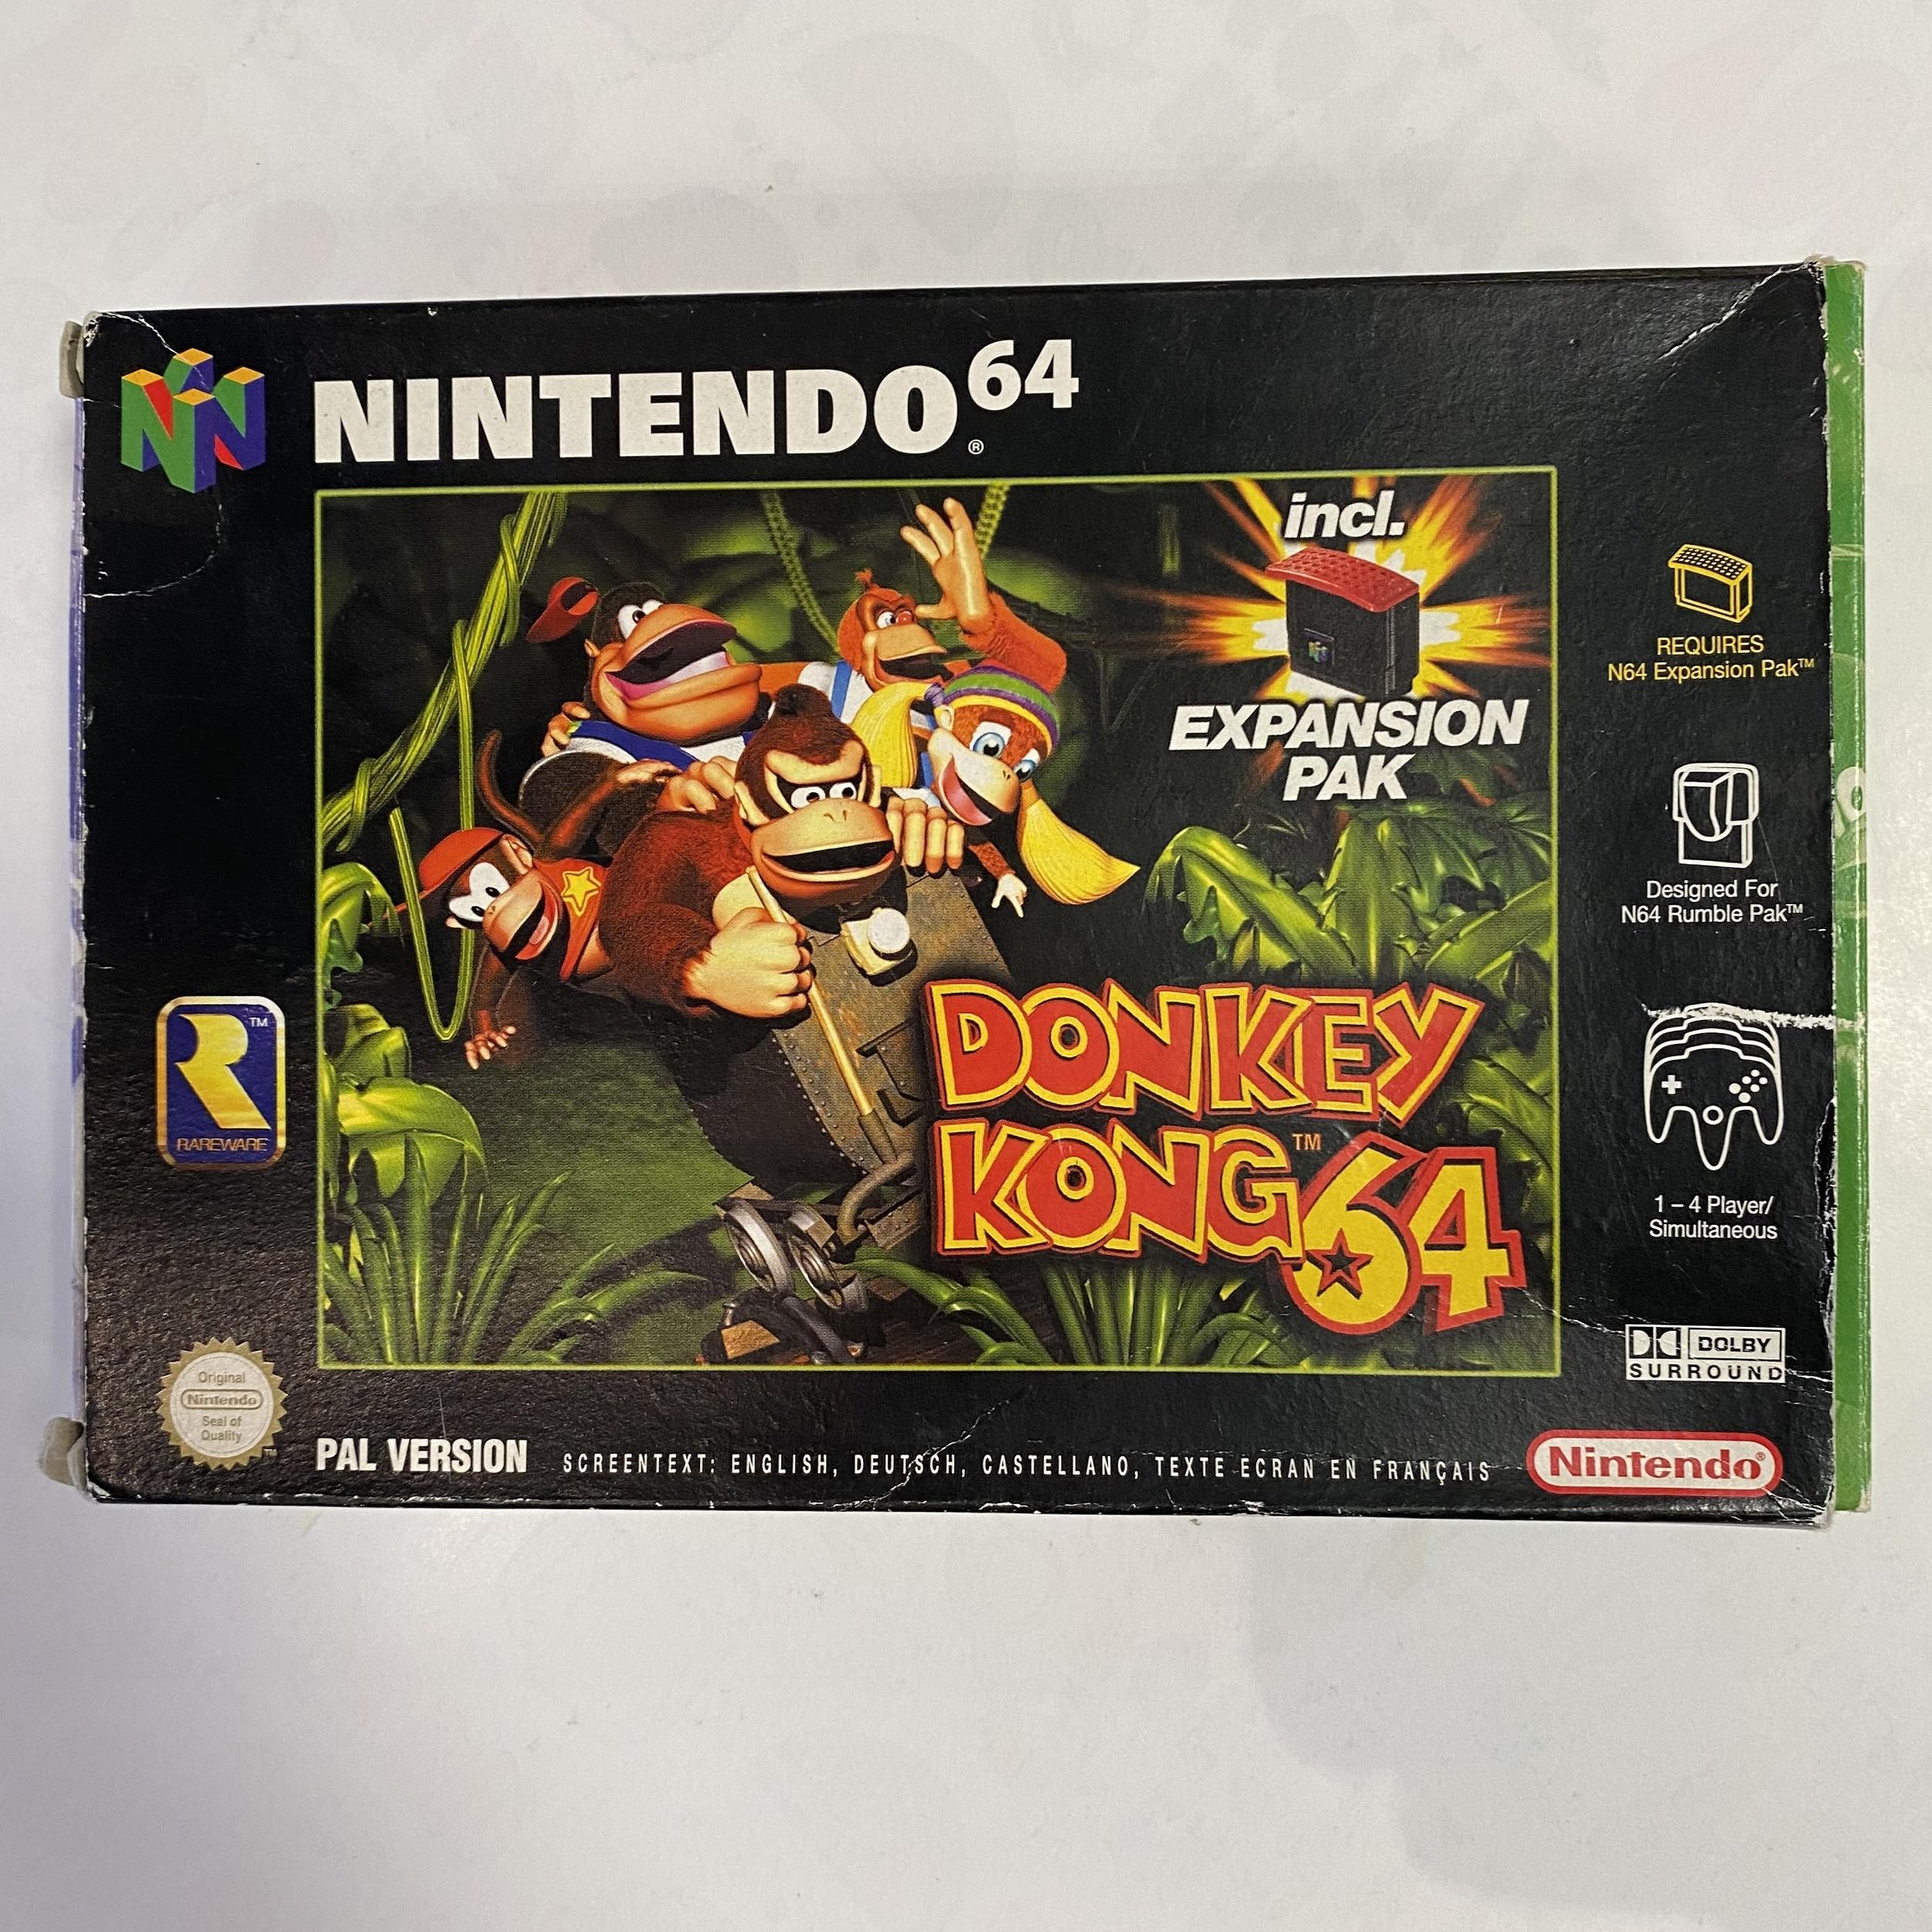 Nintendo 64 - Donkey Kong 64 occasion